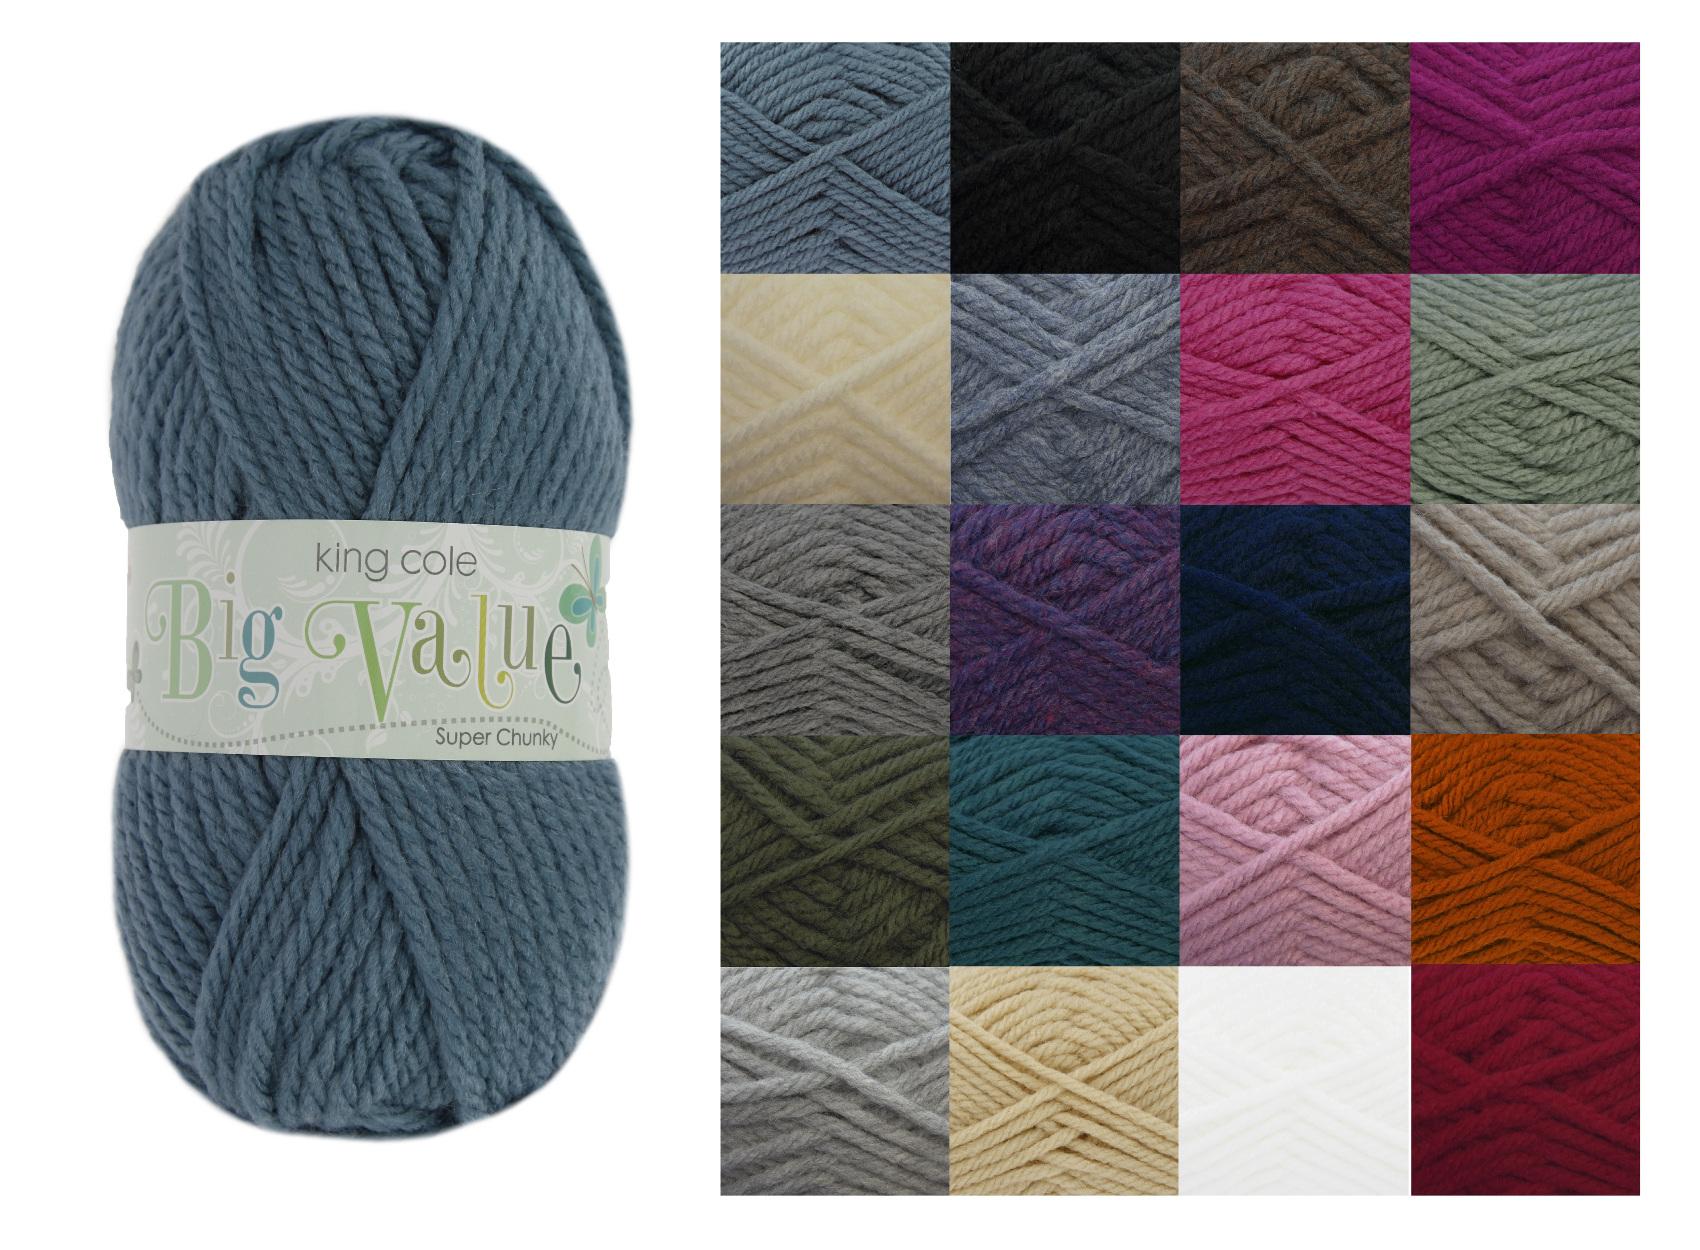 Chunky Yarn : king-cole-big-value-super-chunky-yarn-wool-20-shades-group-image.jpg